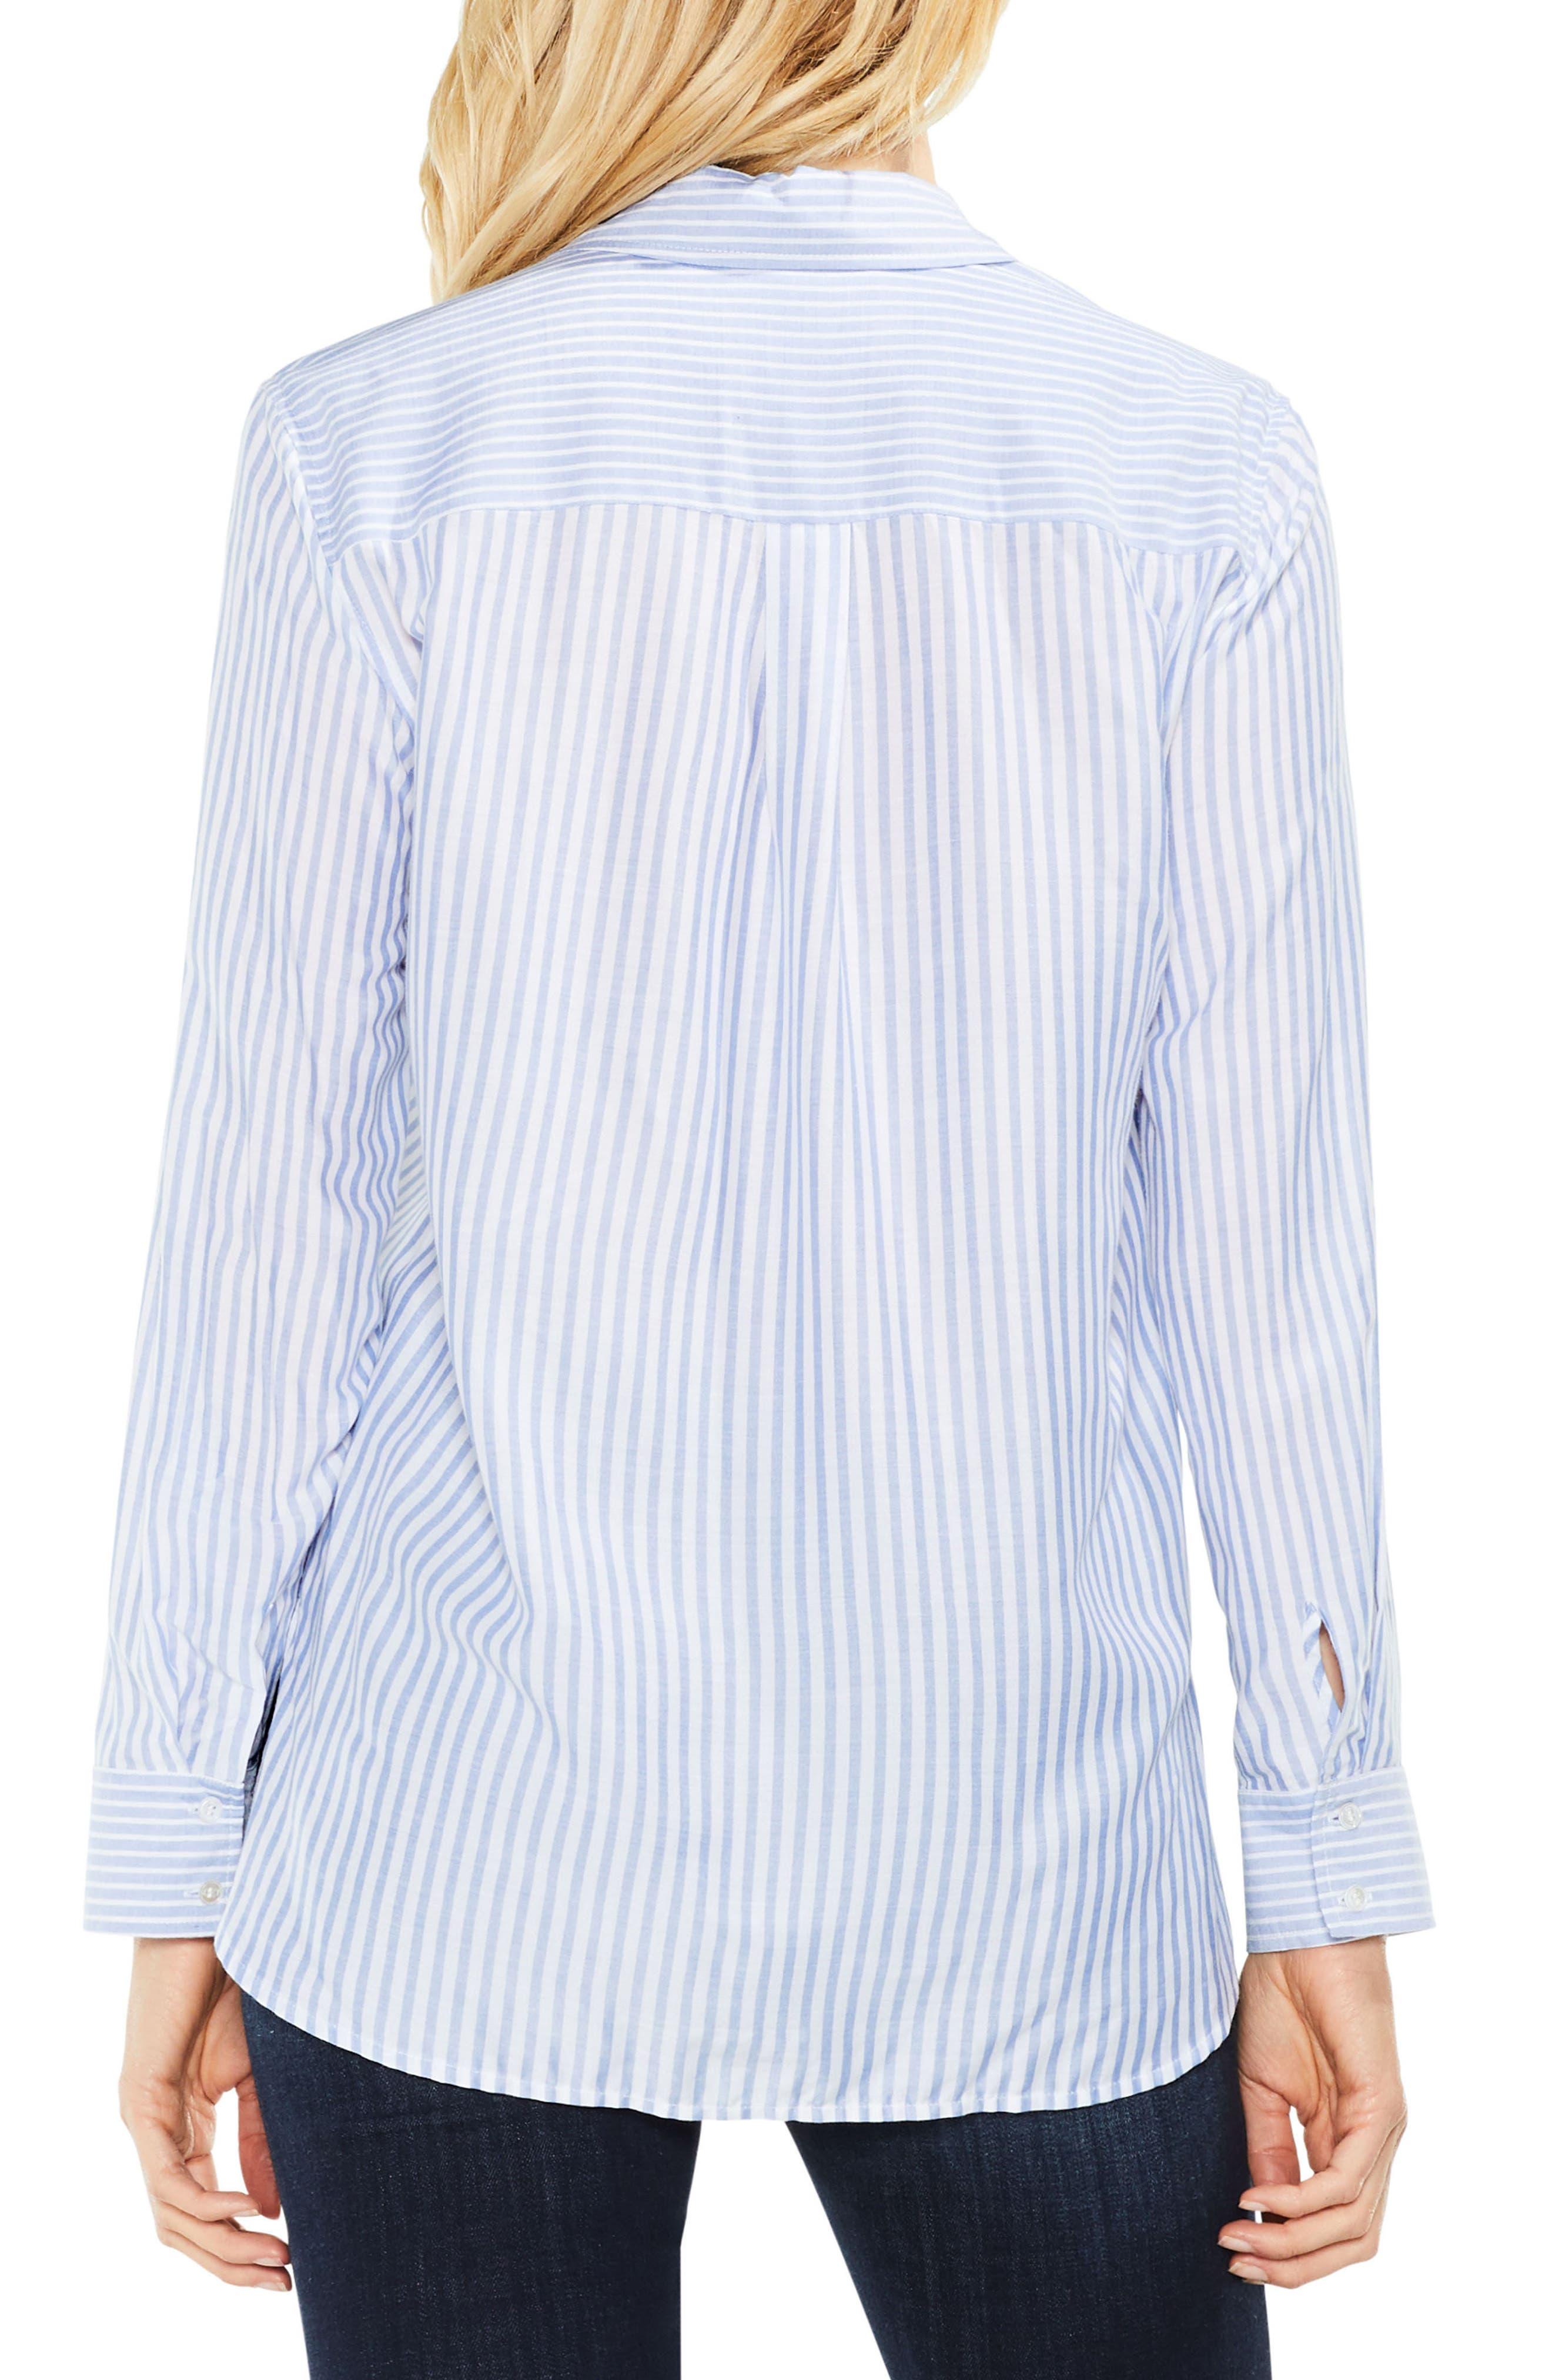 Roll Tab Two-Pocket Shirt,                             Alternate thumbnail 2, color,                             405